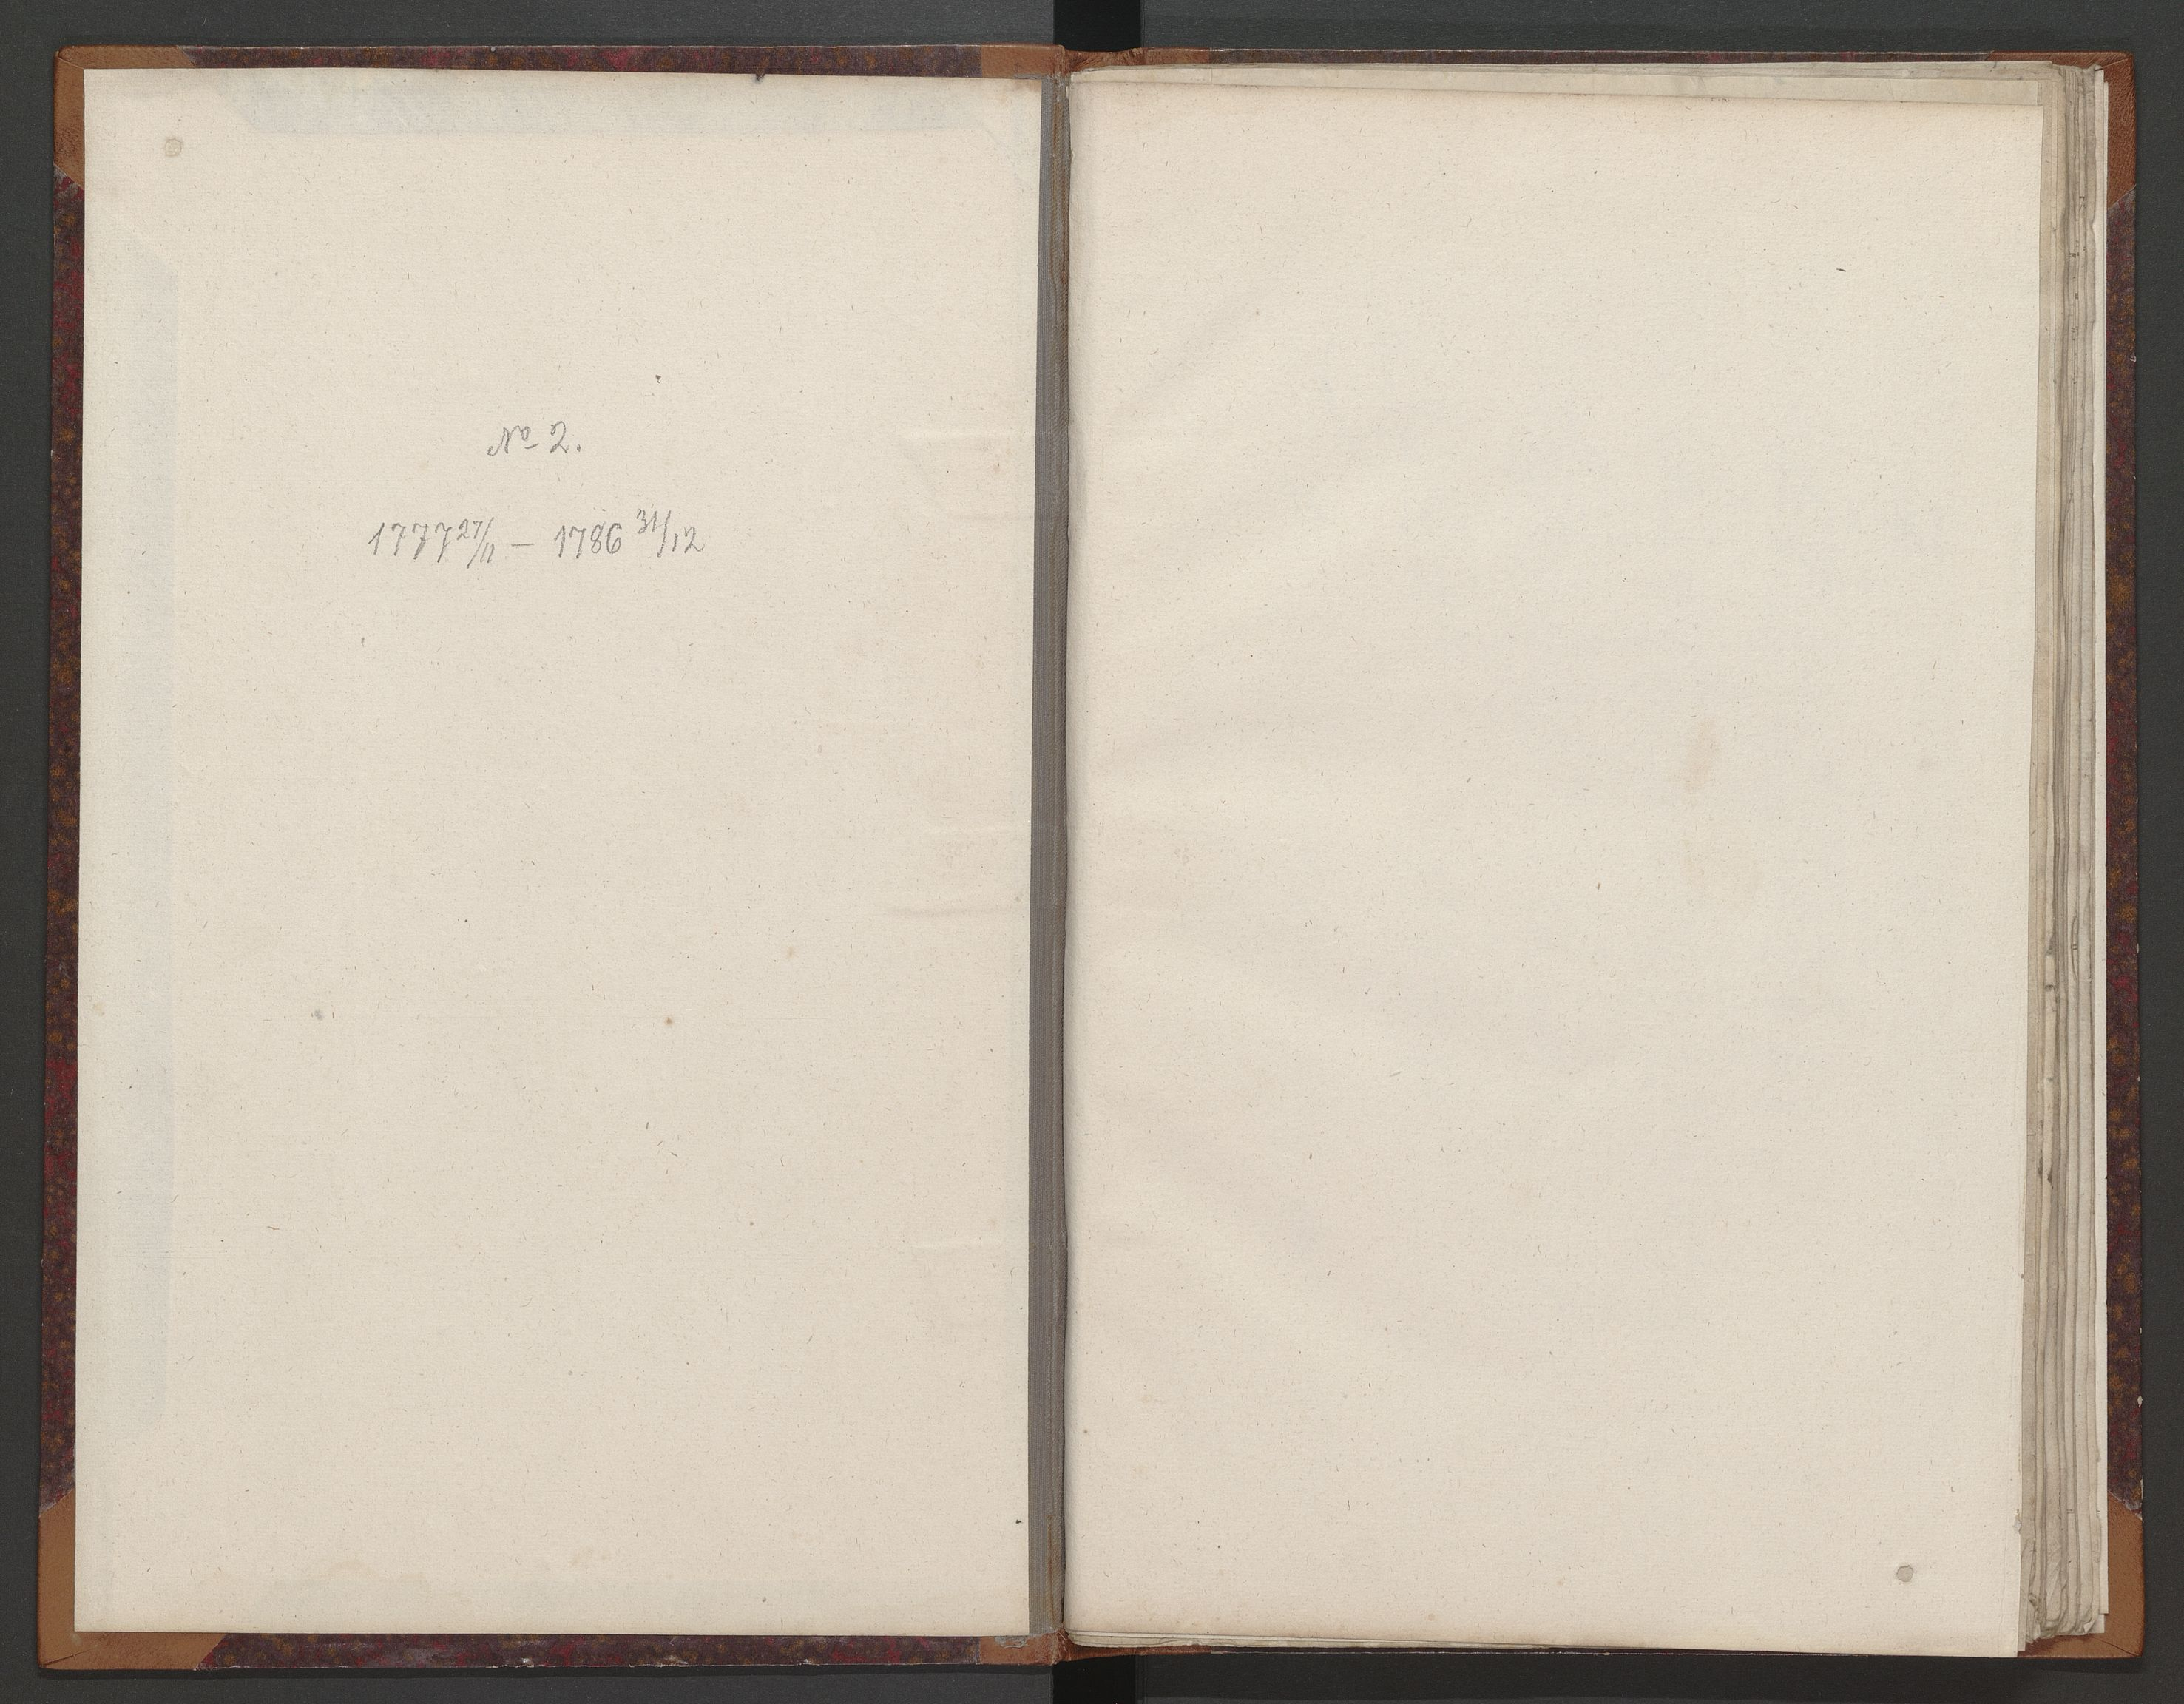 SAT, Kristiansund magistrat, K/L0002: Branntakstprotokoll, 1777-1786